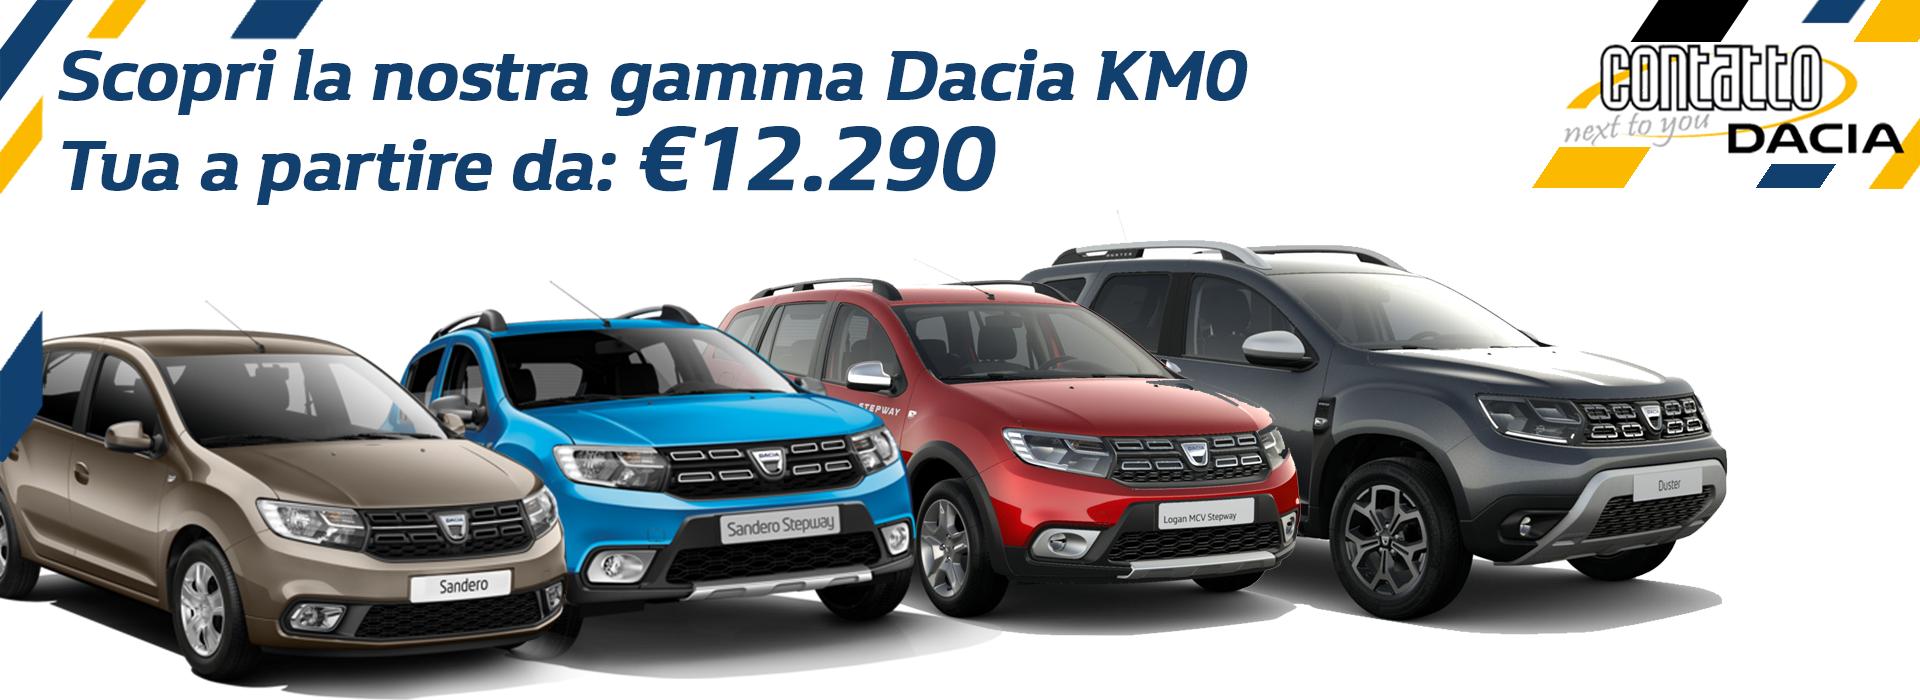 Home page -KM0 Dacia